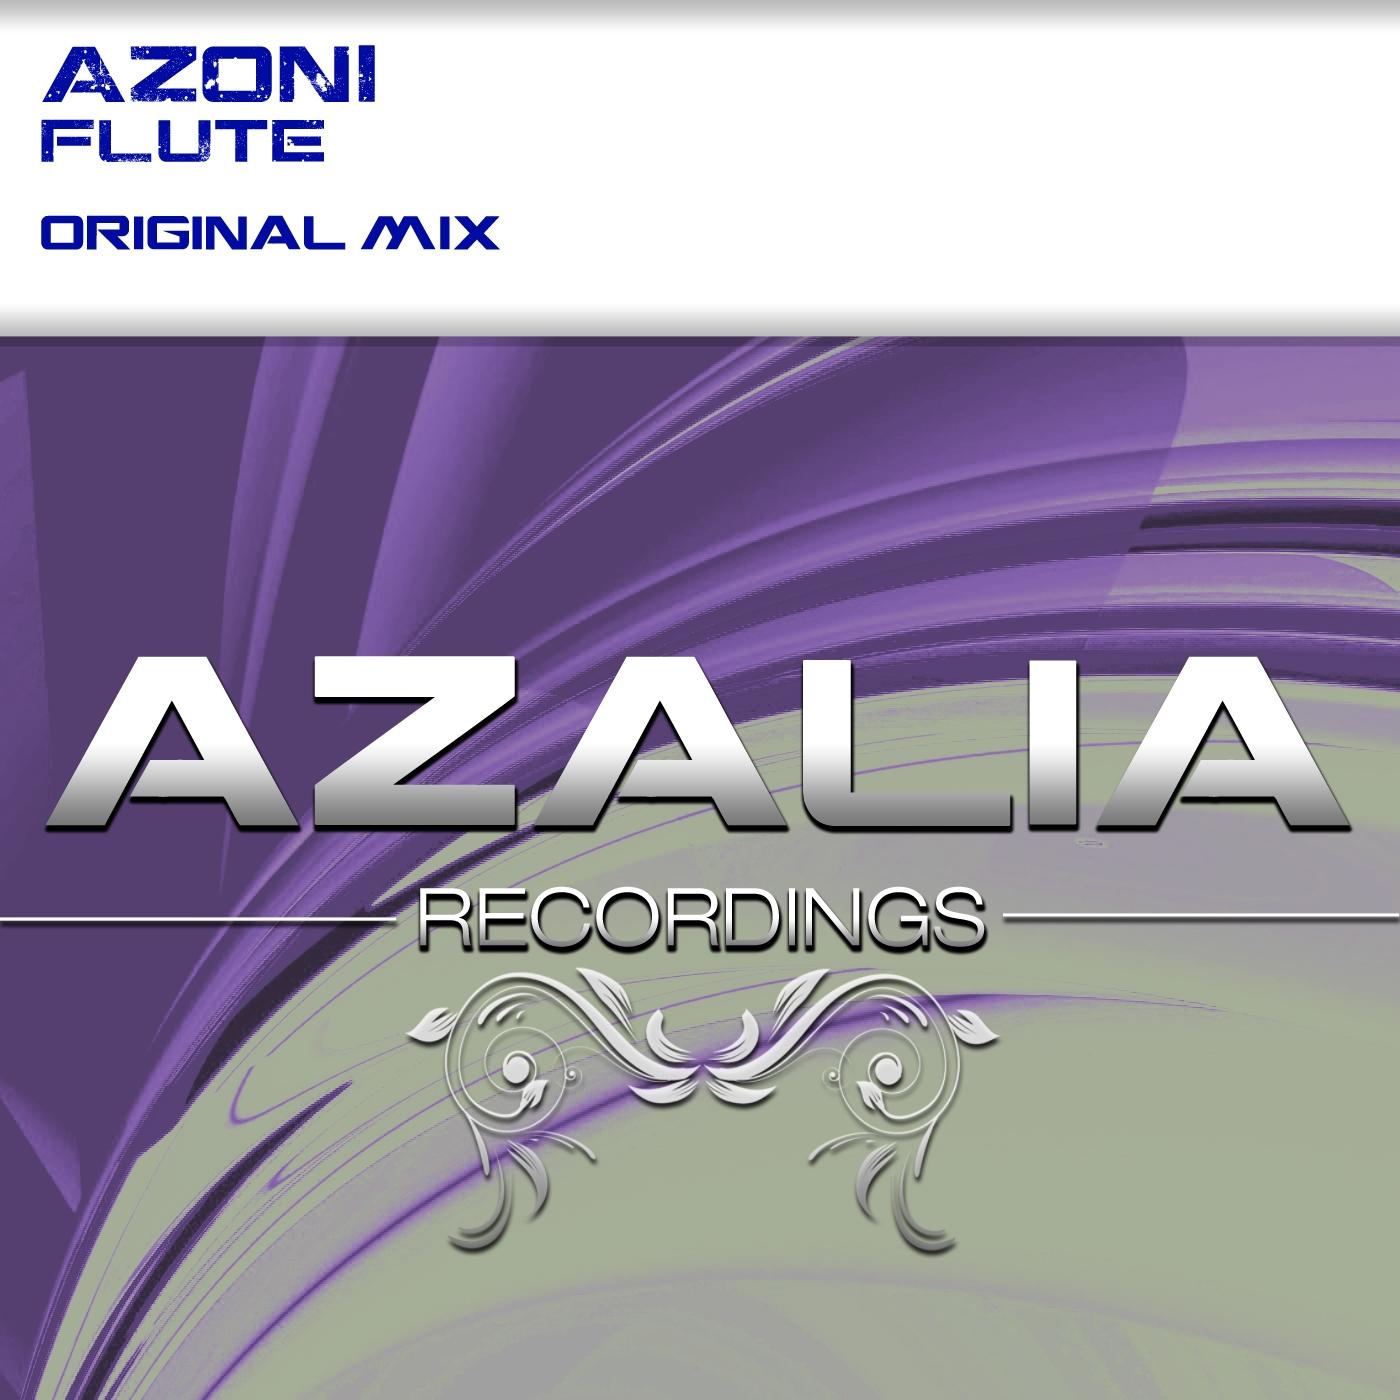 Azoni - Flute (Original Mix)